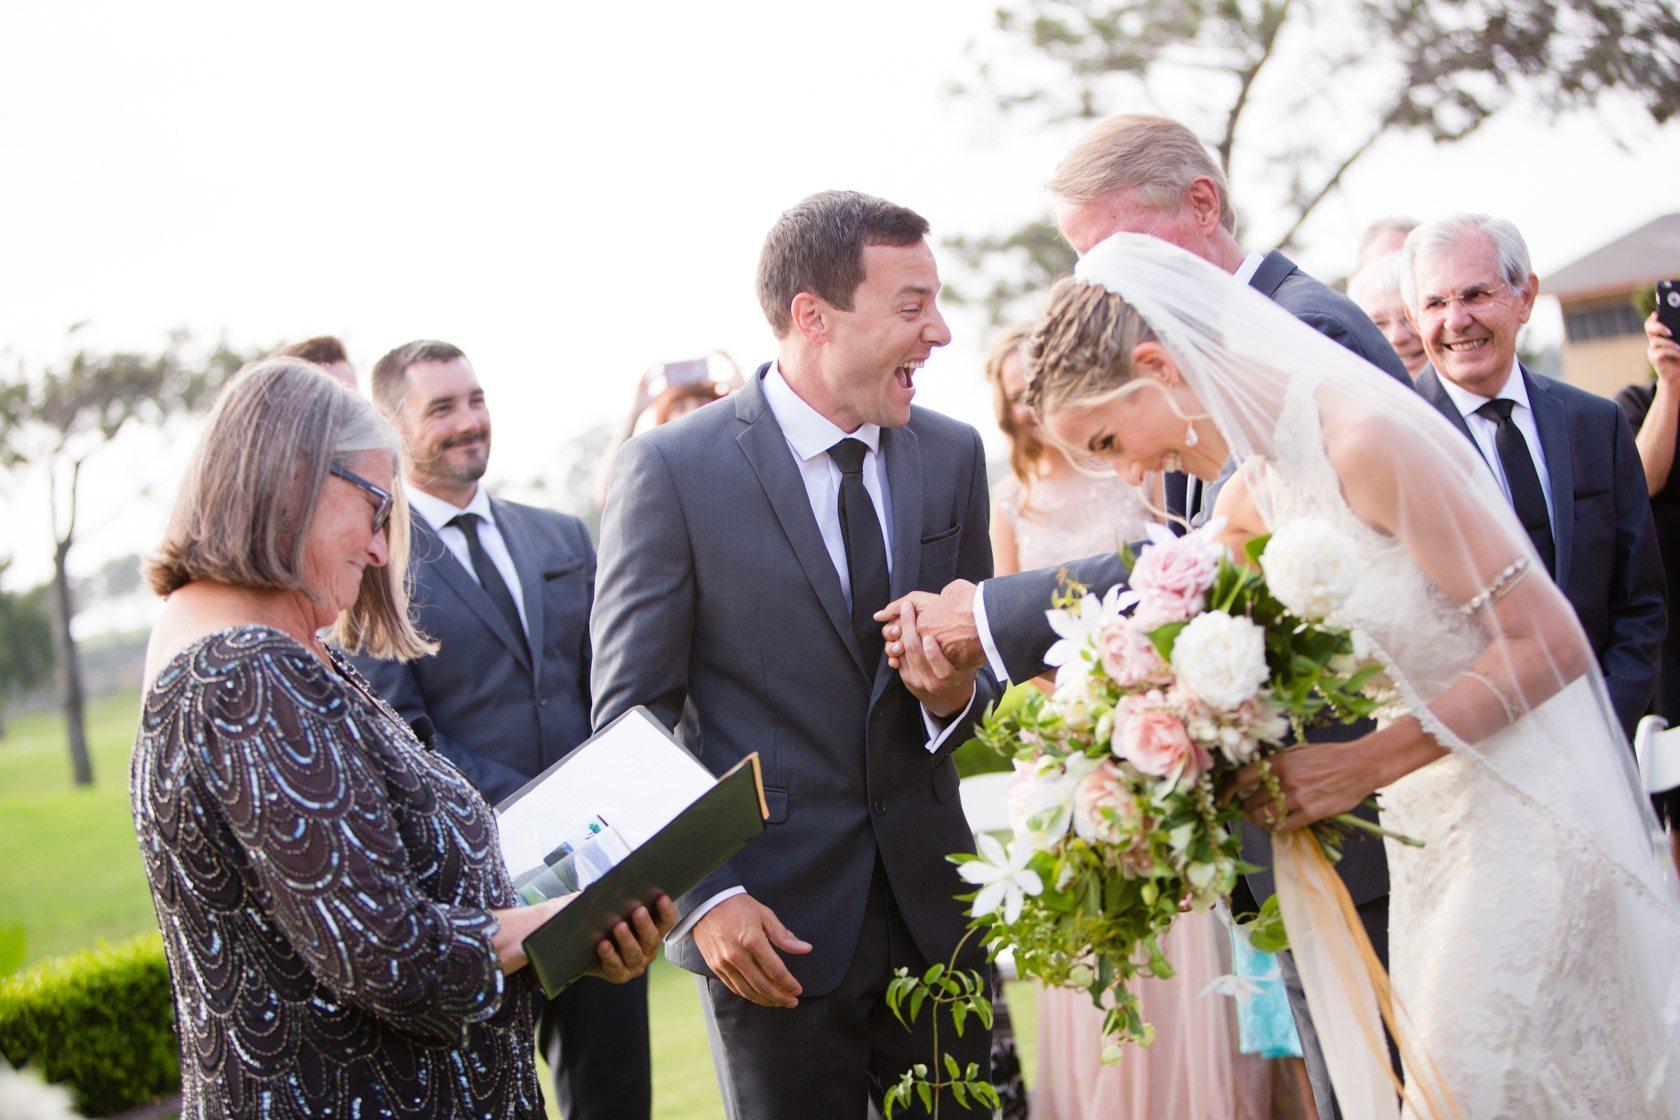 The_Lodge_at_Torrey_Pines_Wedding_048.jpg